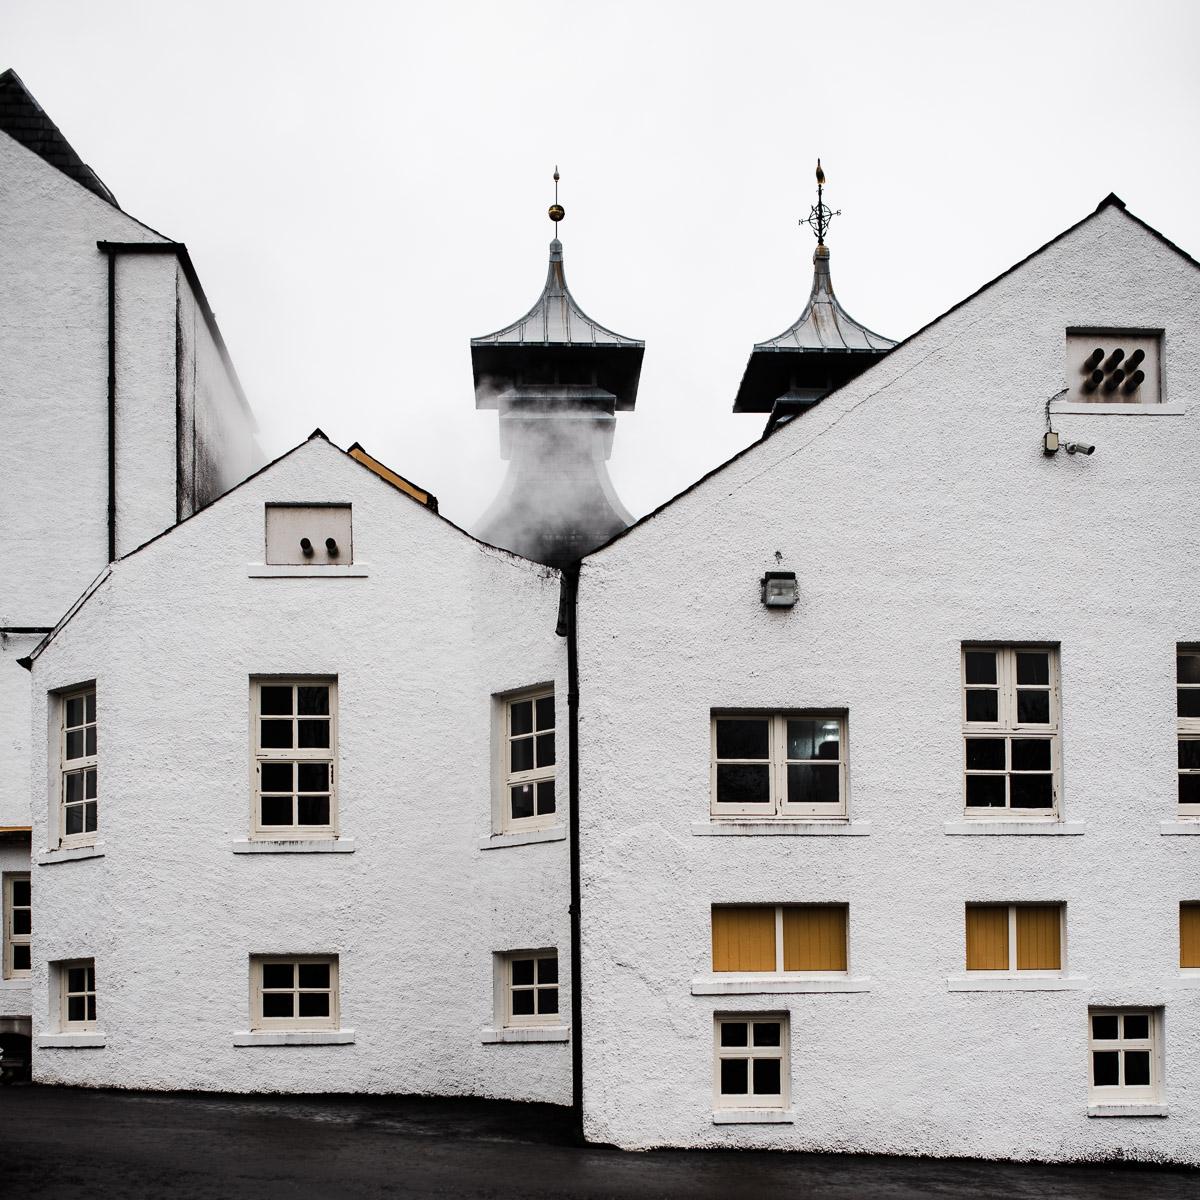 Strathisla Distillery (Whisky)